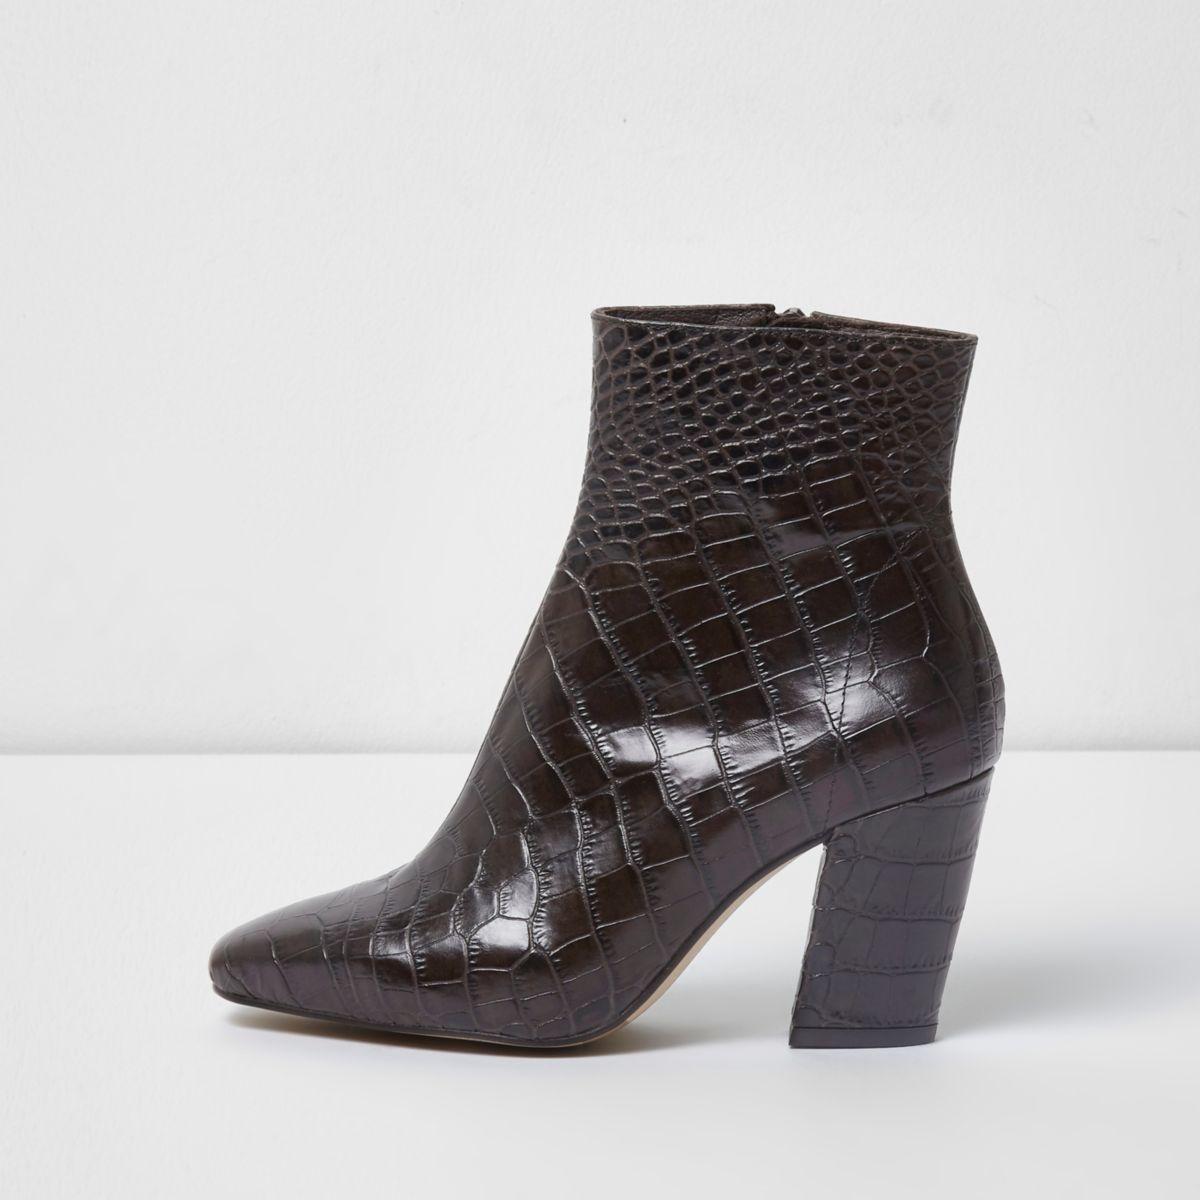 Donkerbruine leren laarzen met krokodillenprint en blokhak